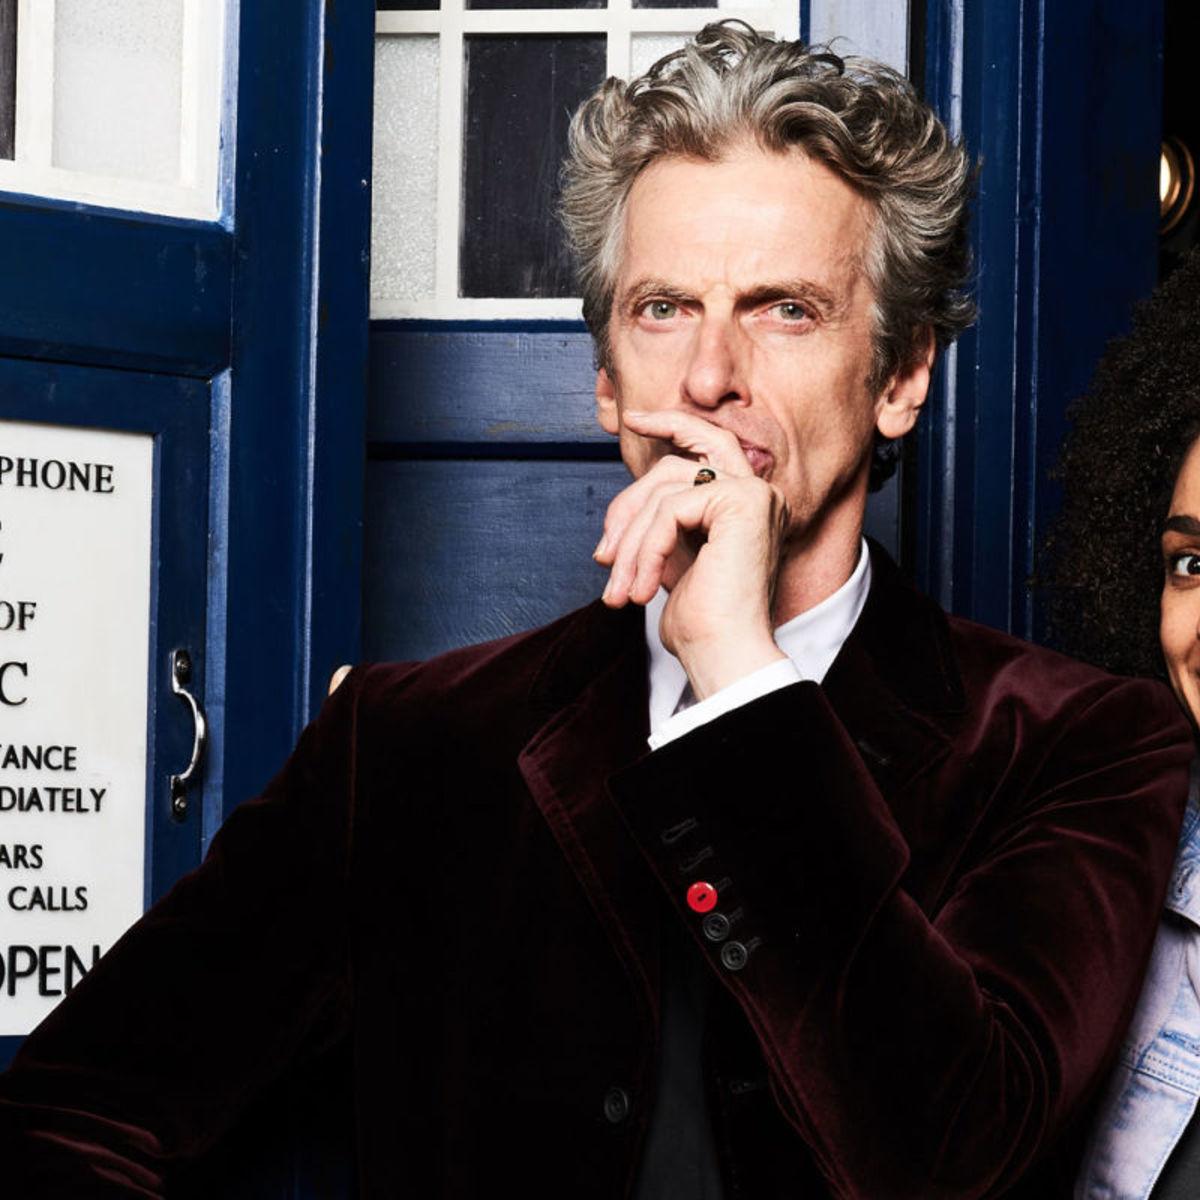 Doctor_Who_10.jpg